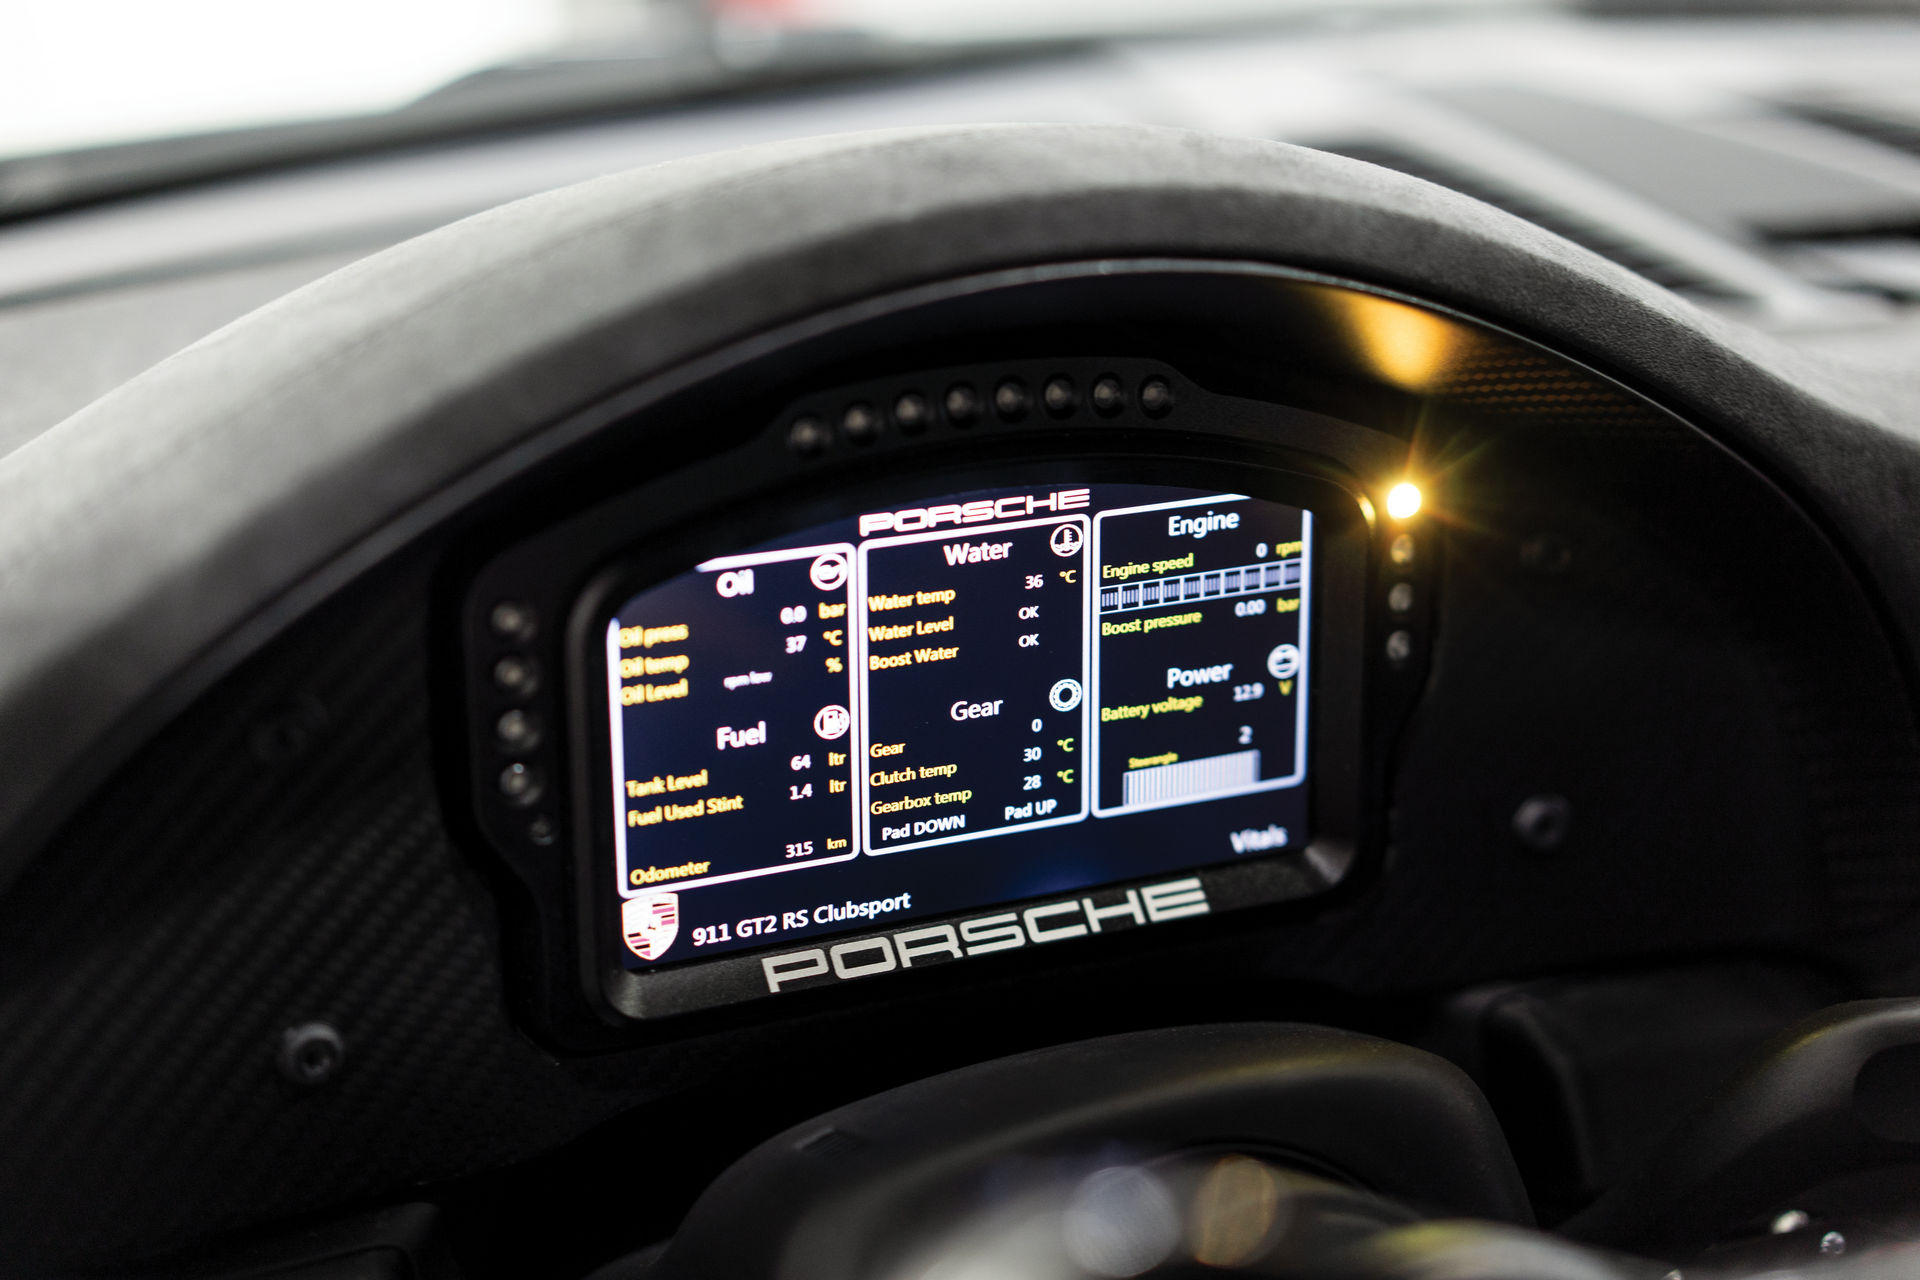 Porsche-911-GT2-RS-Clubsport-auction-15